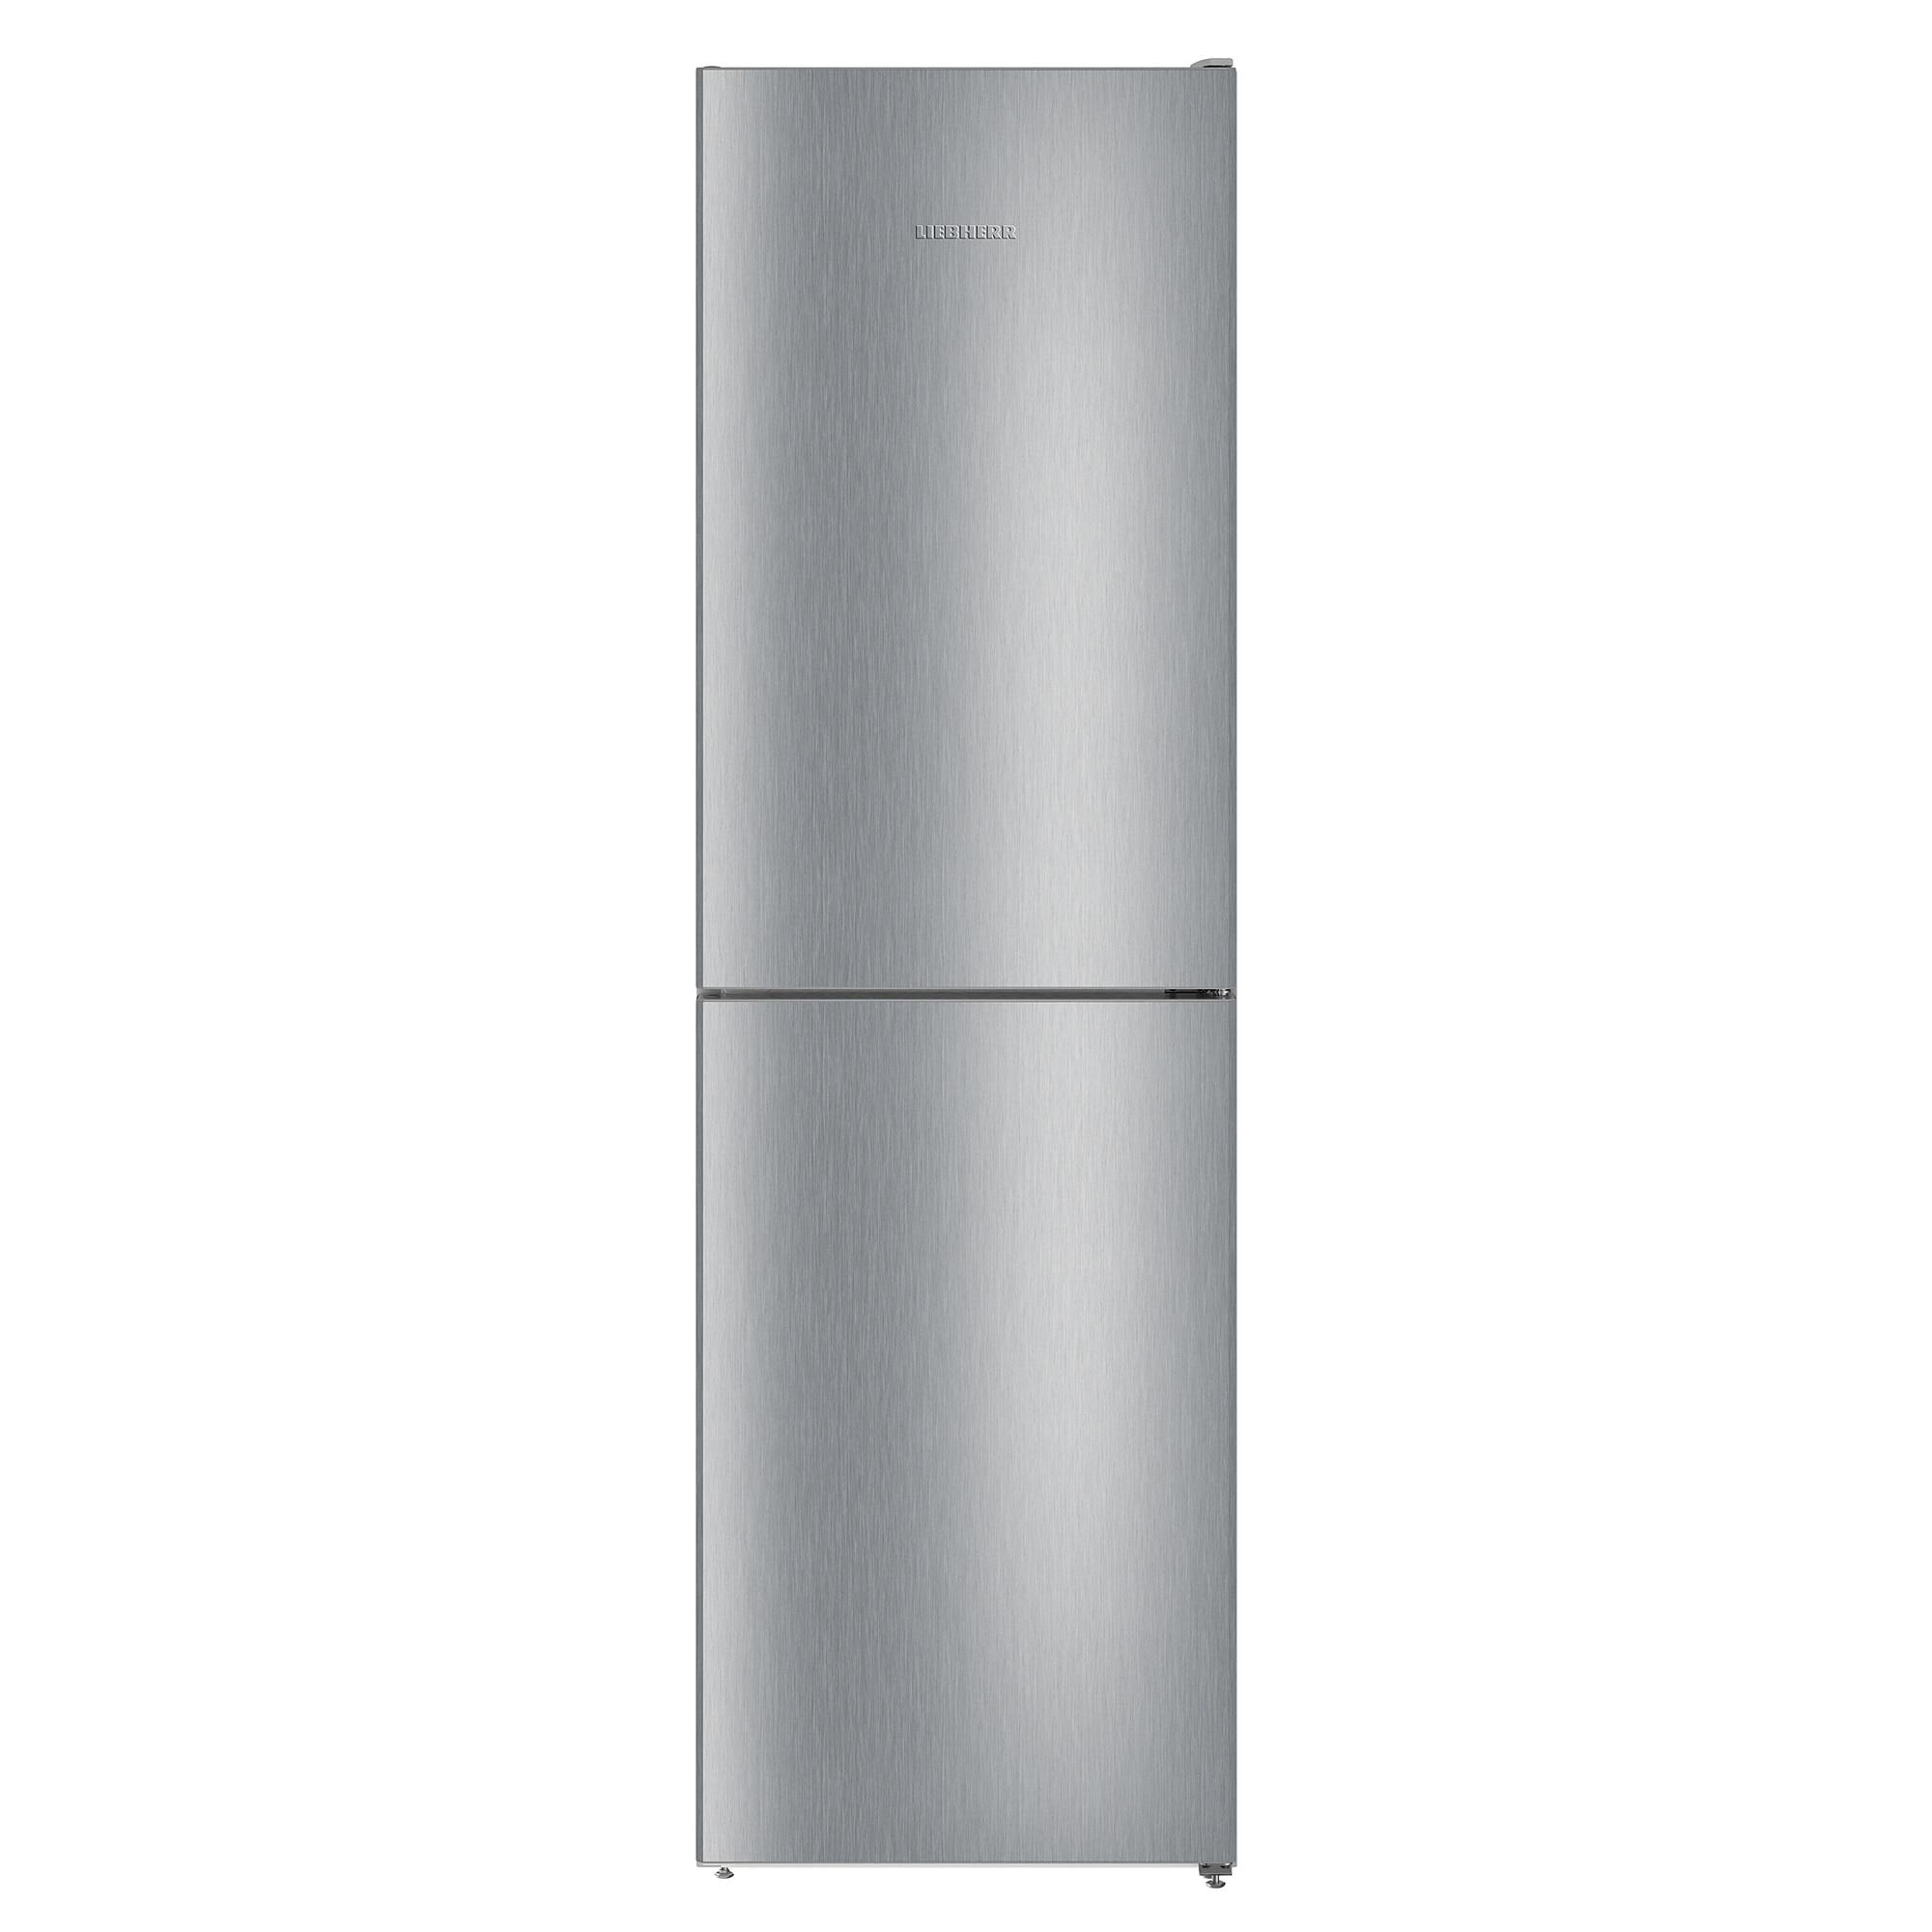 Fotografie Combina frigorifica Liebherr CNel 4713, 328 L, No Frost, Display, Control taste, Raft sticle, Alarma usa, H 201.1 cm, Clasa A++, Argintiu